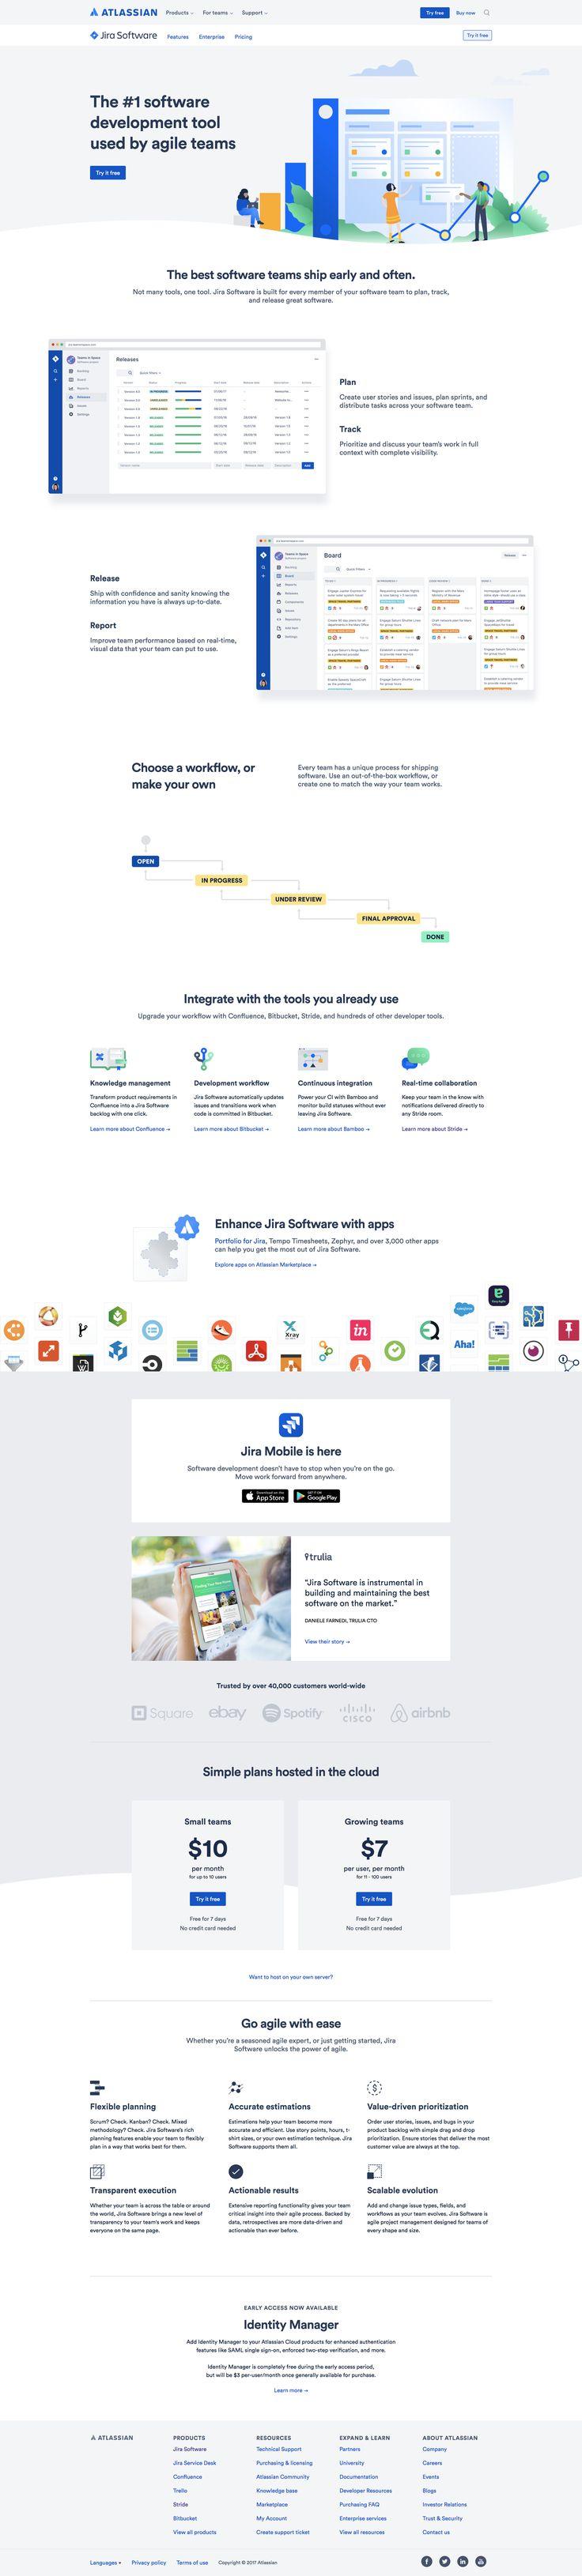 Jira. Web design